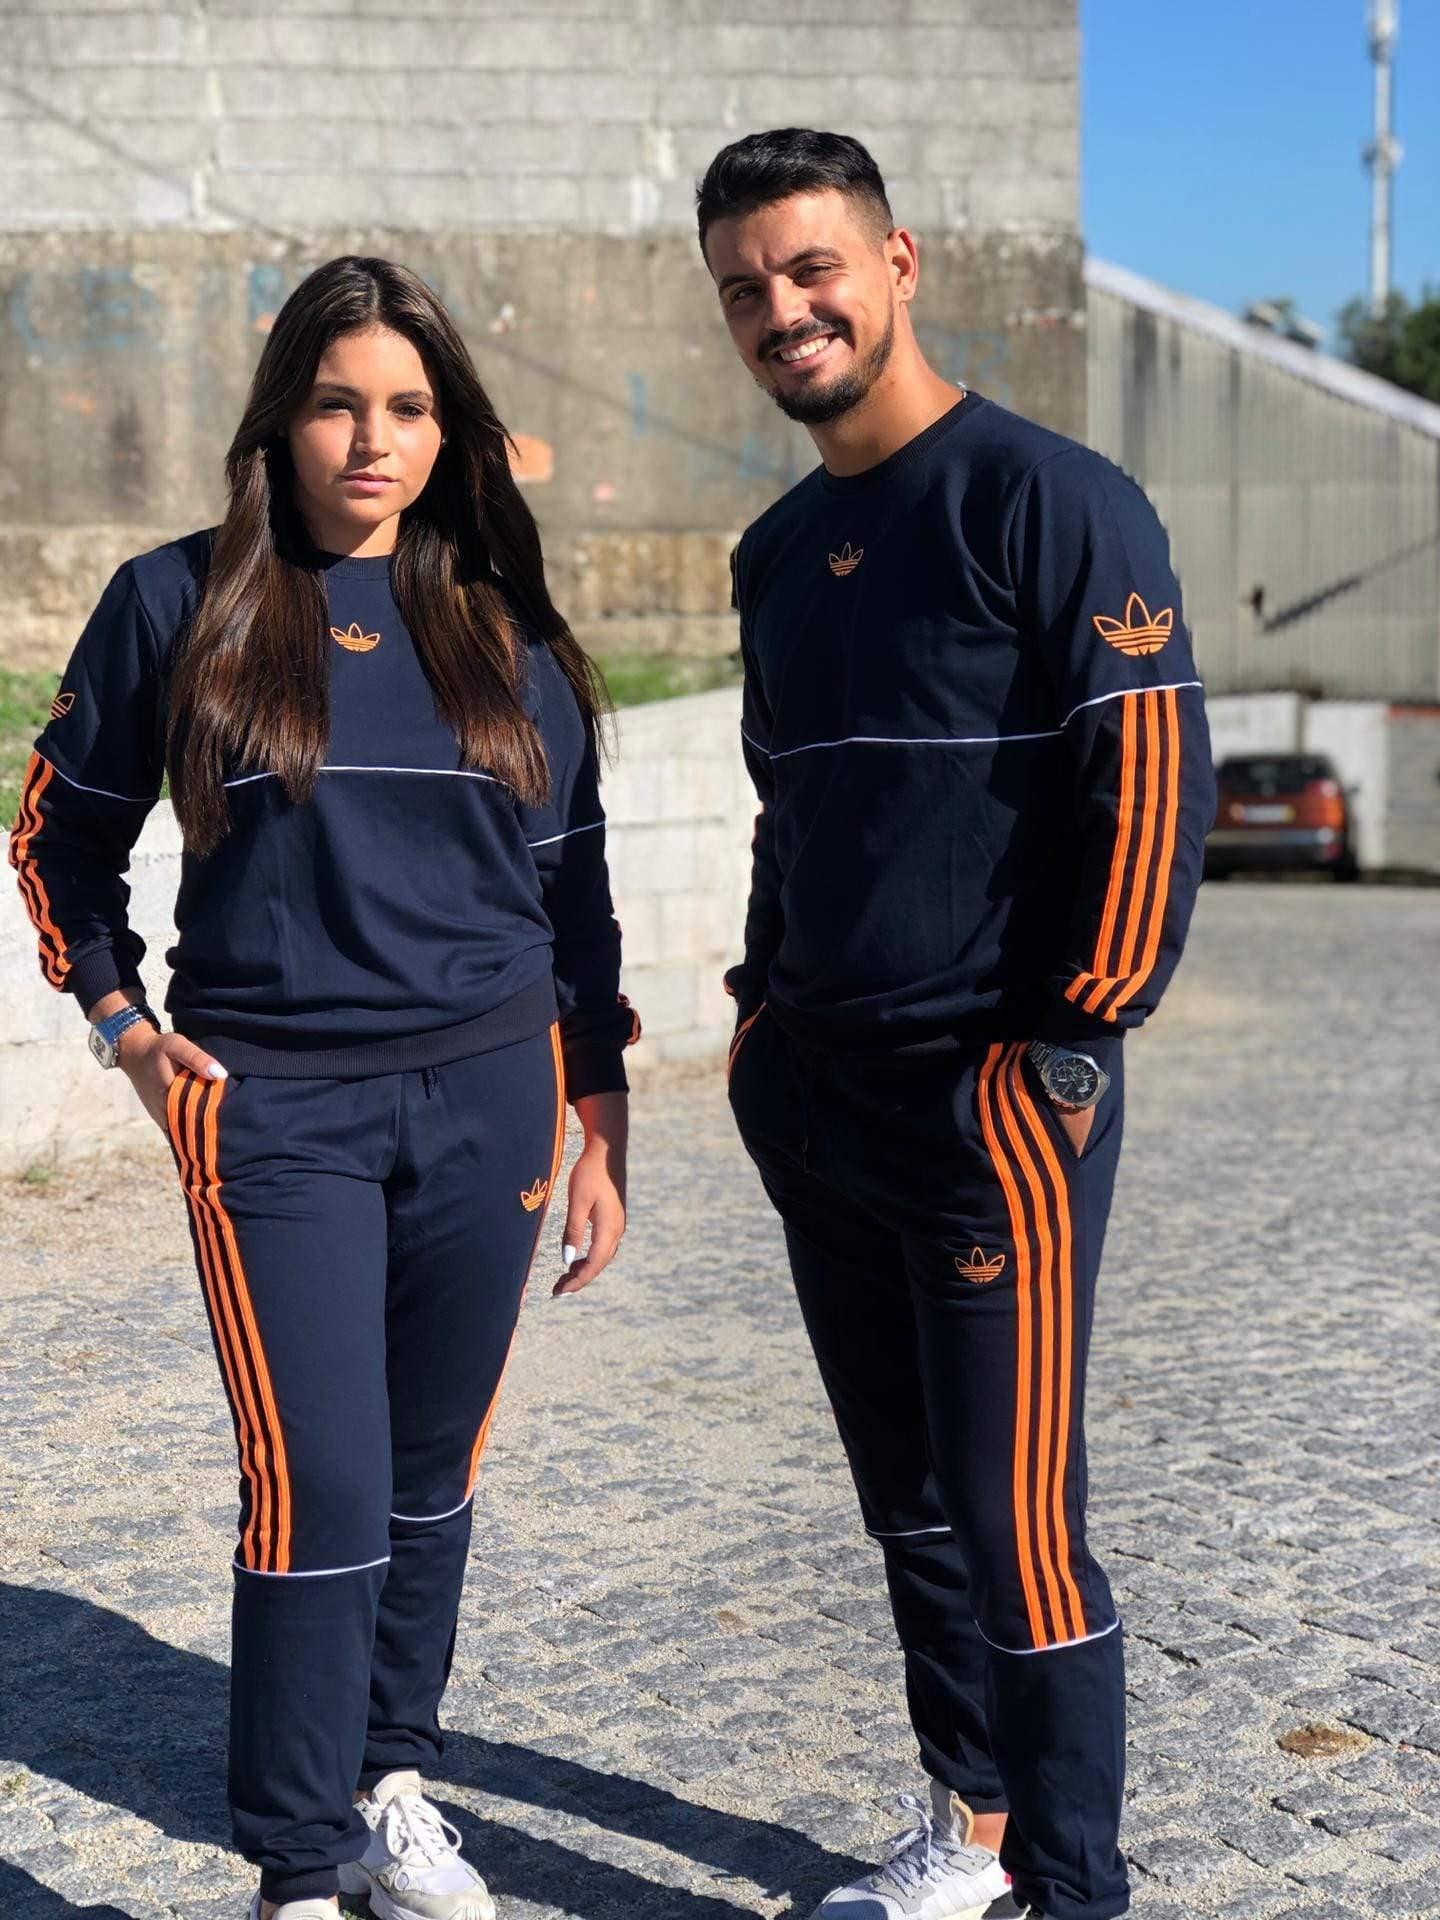 Chandal de Adidas